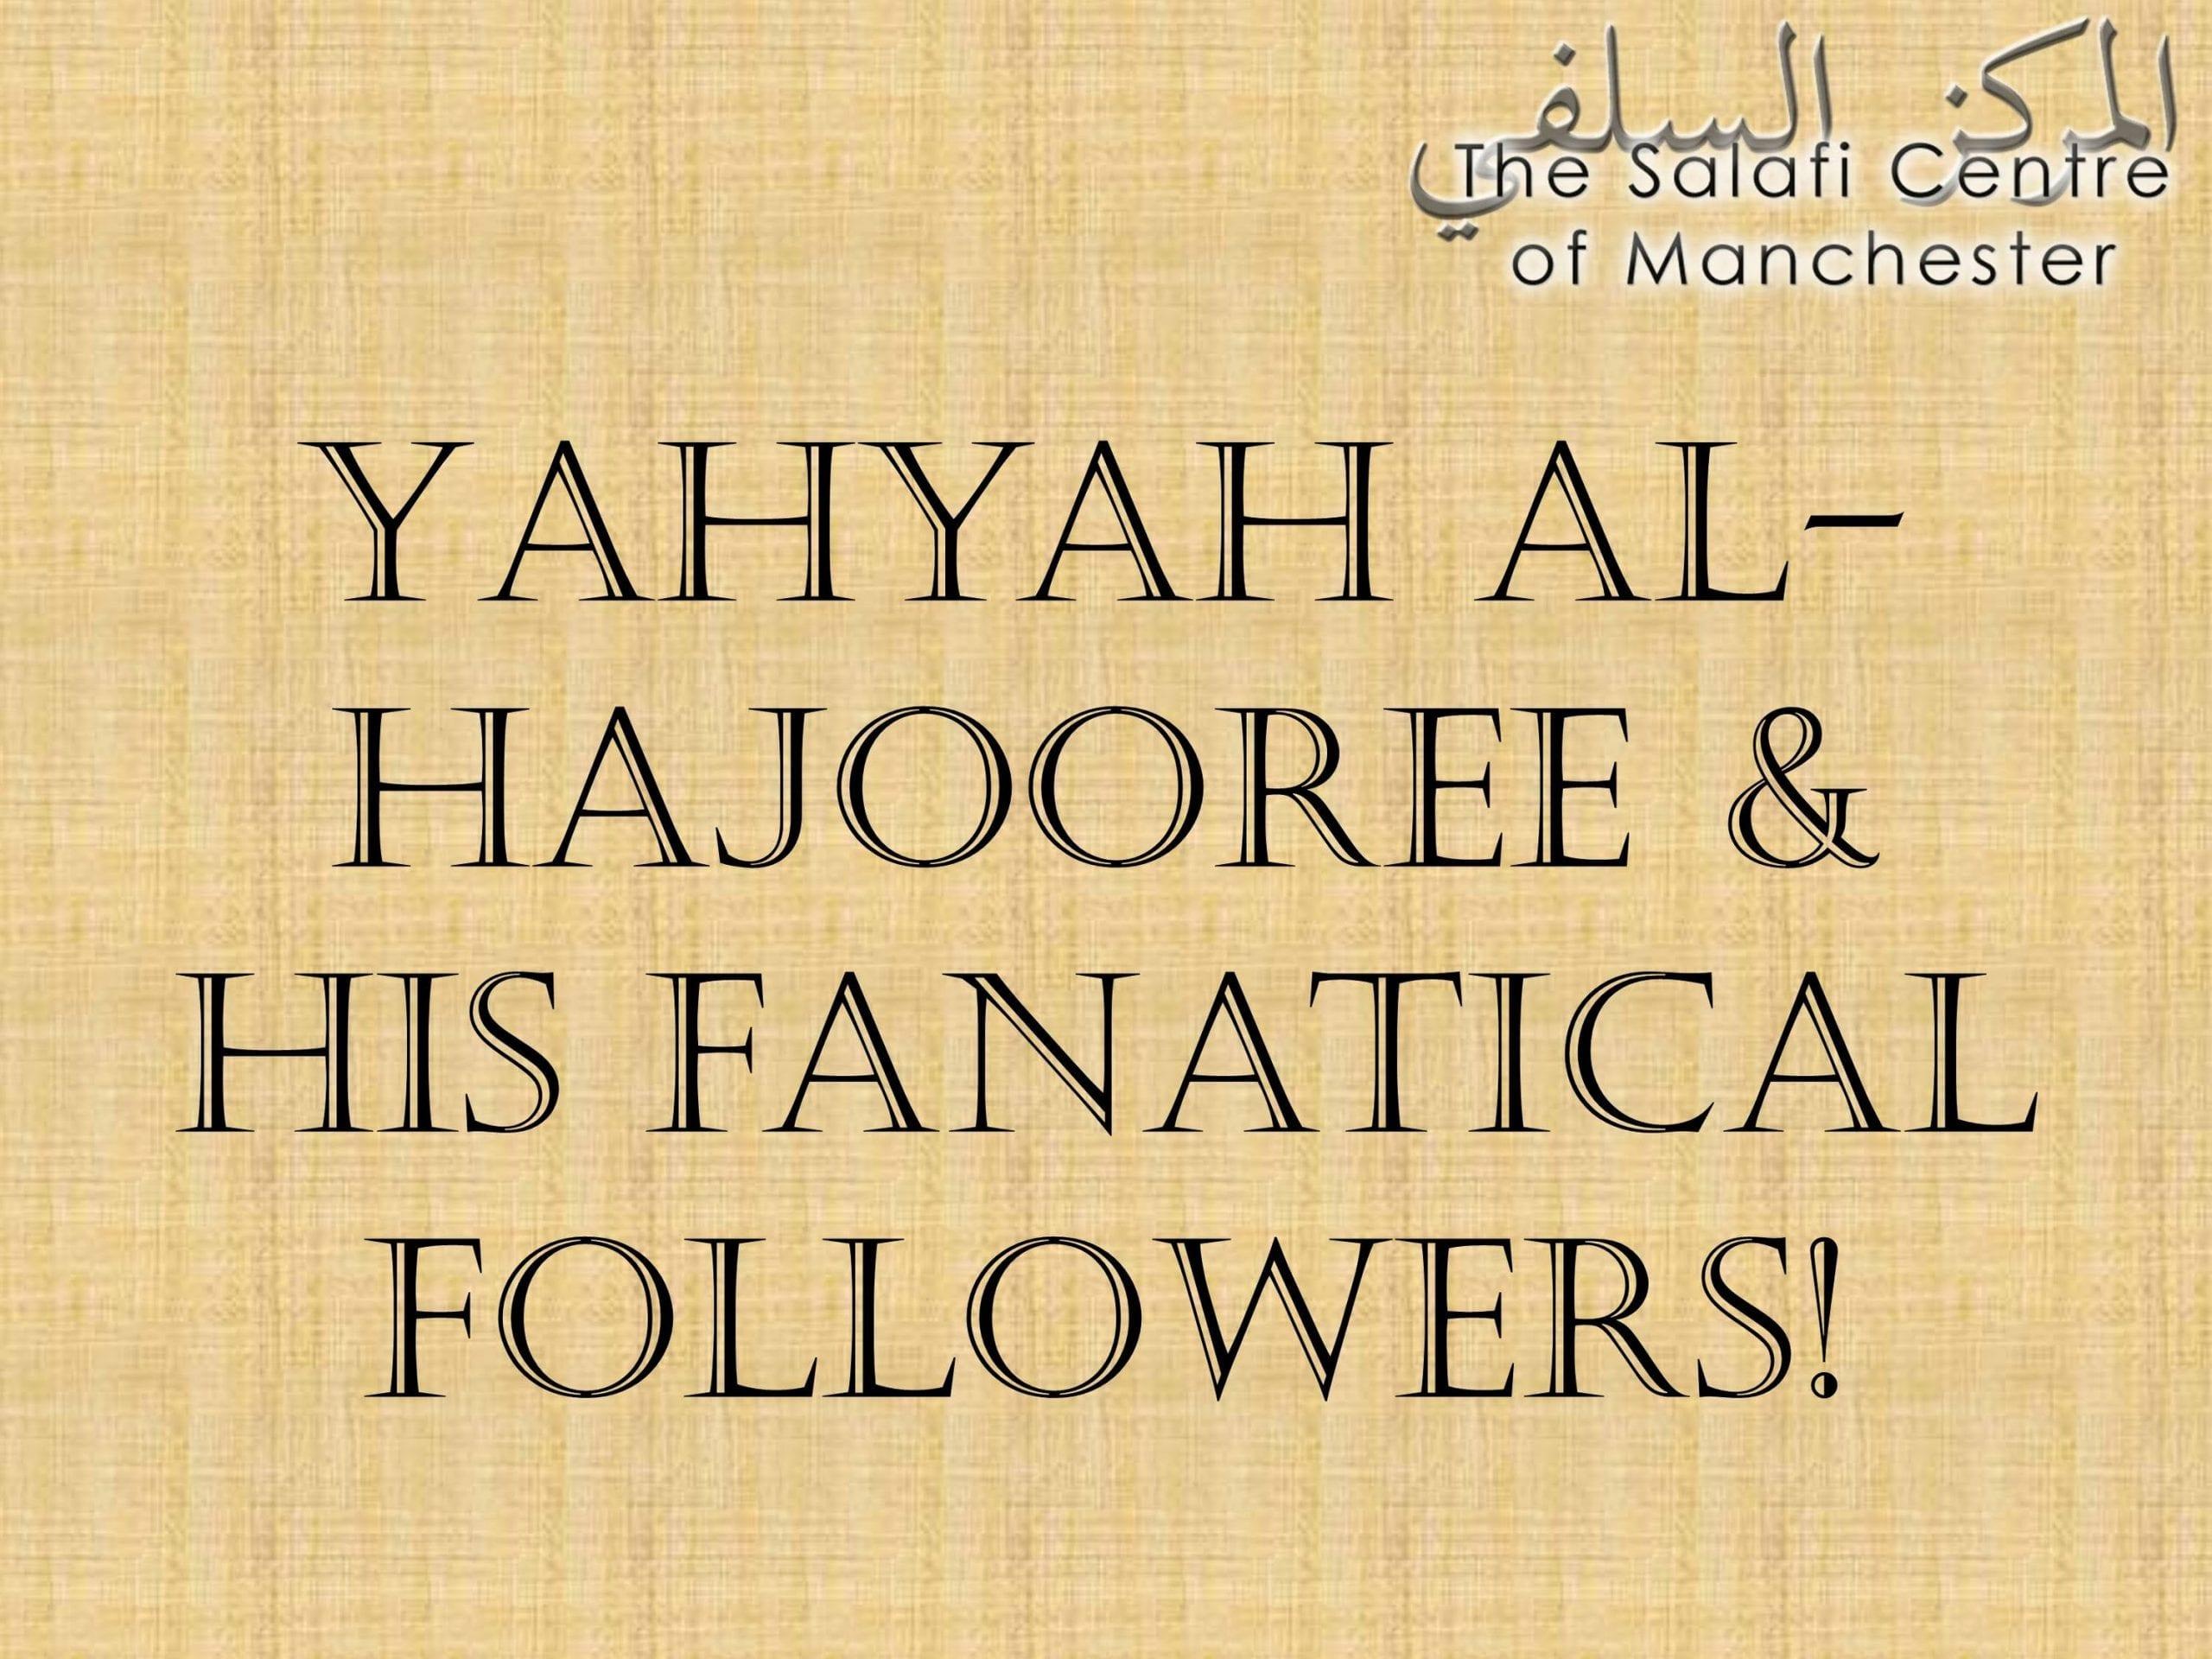 The Ghuloo of Yahyah al-Hajooree and his fanatical followers!